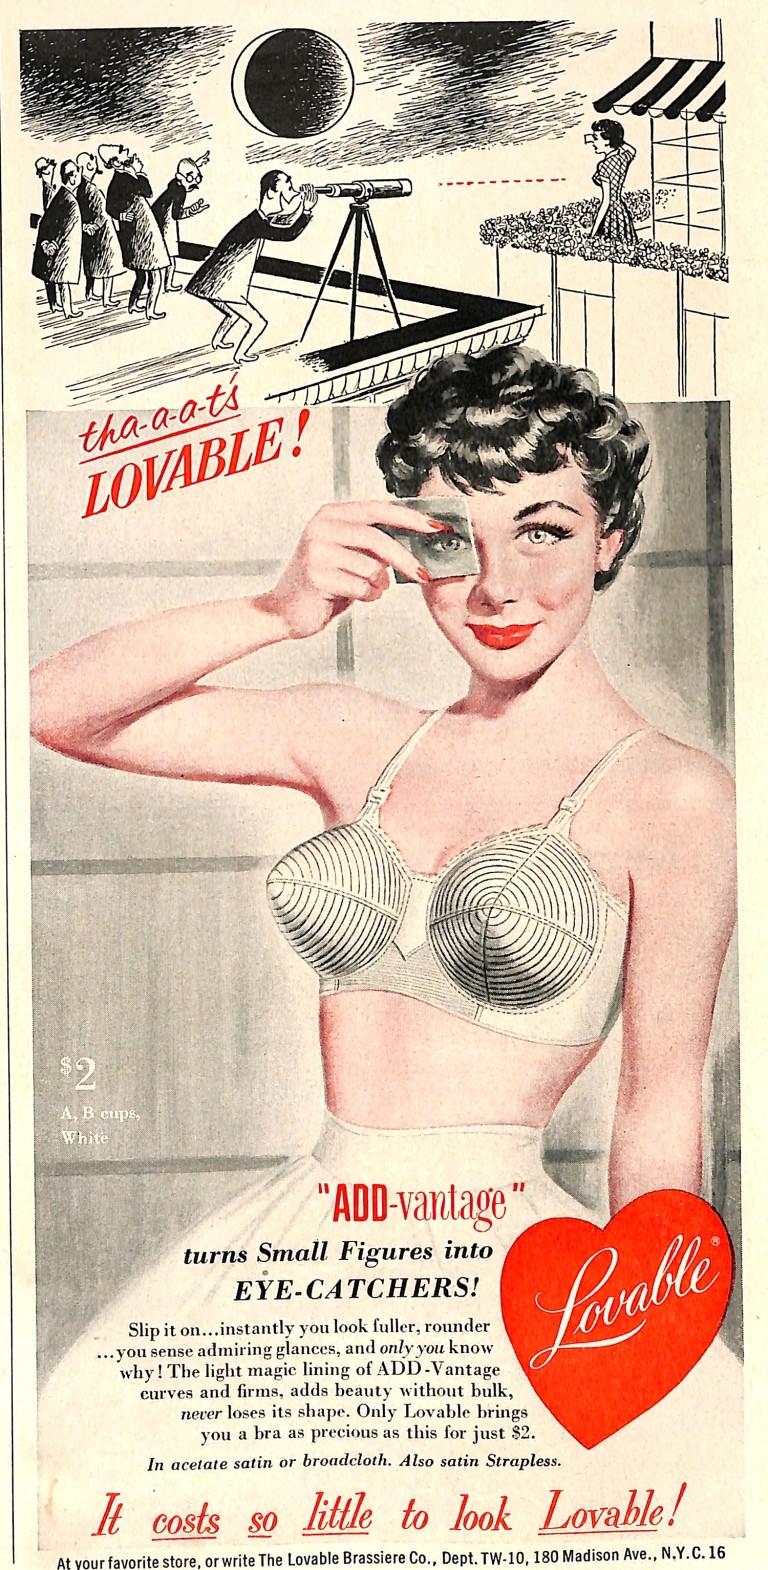 1952 Lovable Bra ad